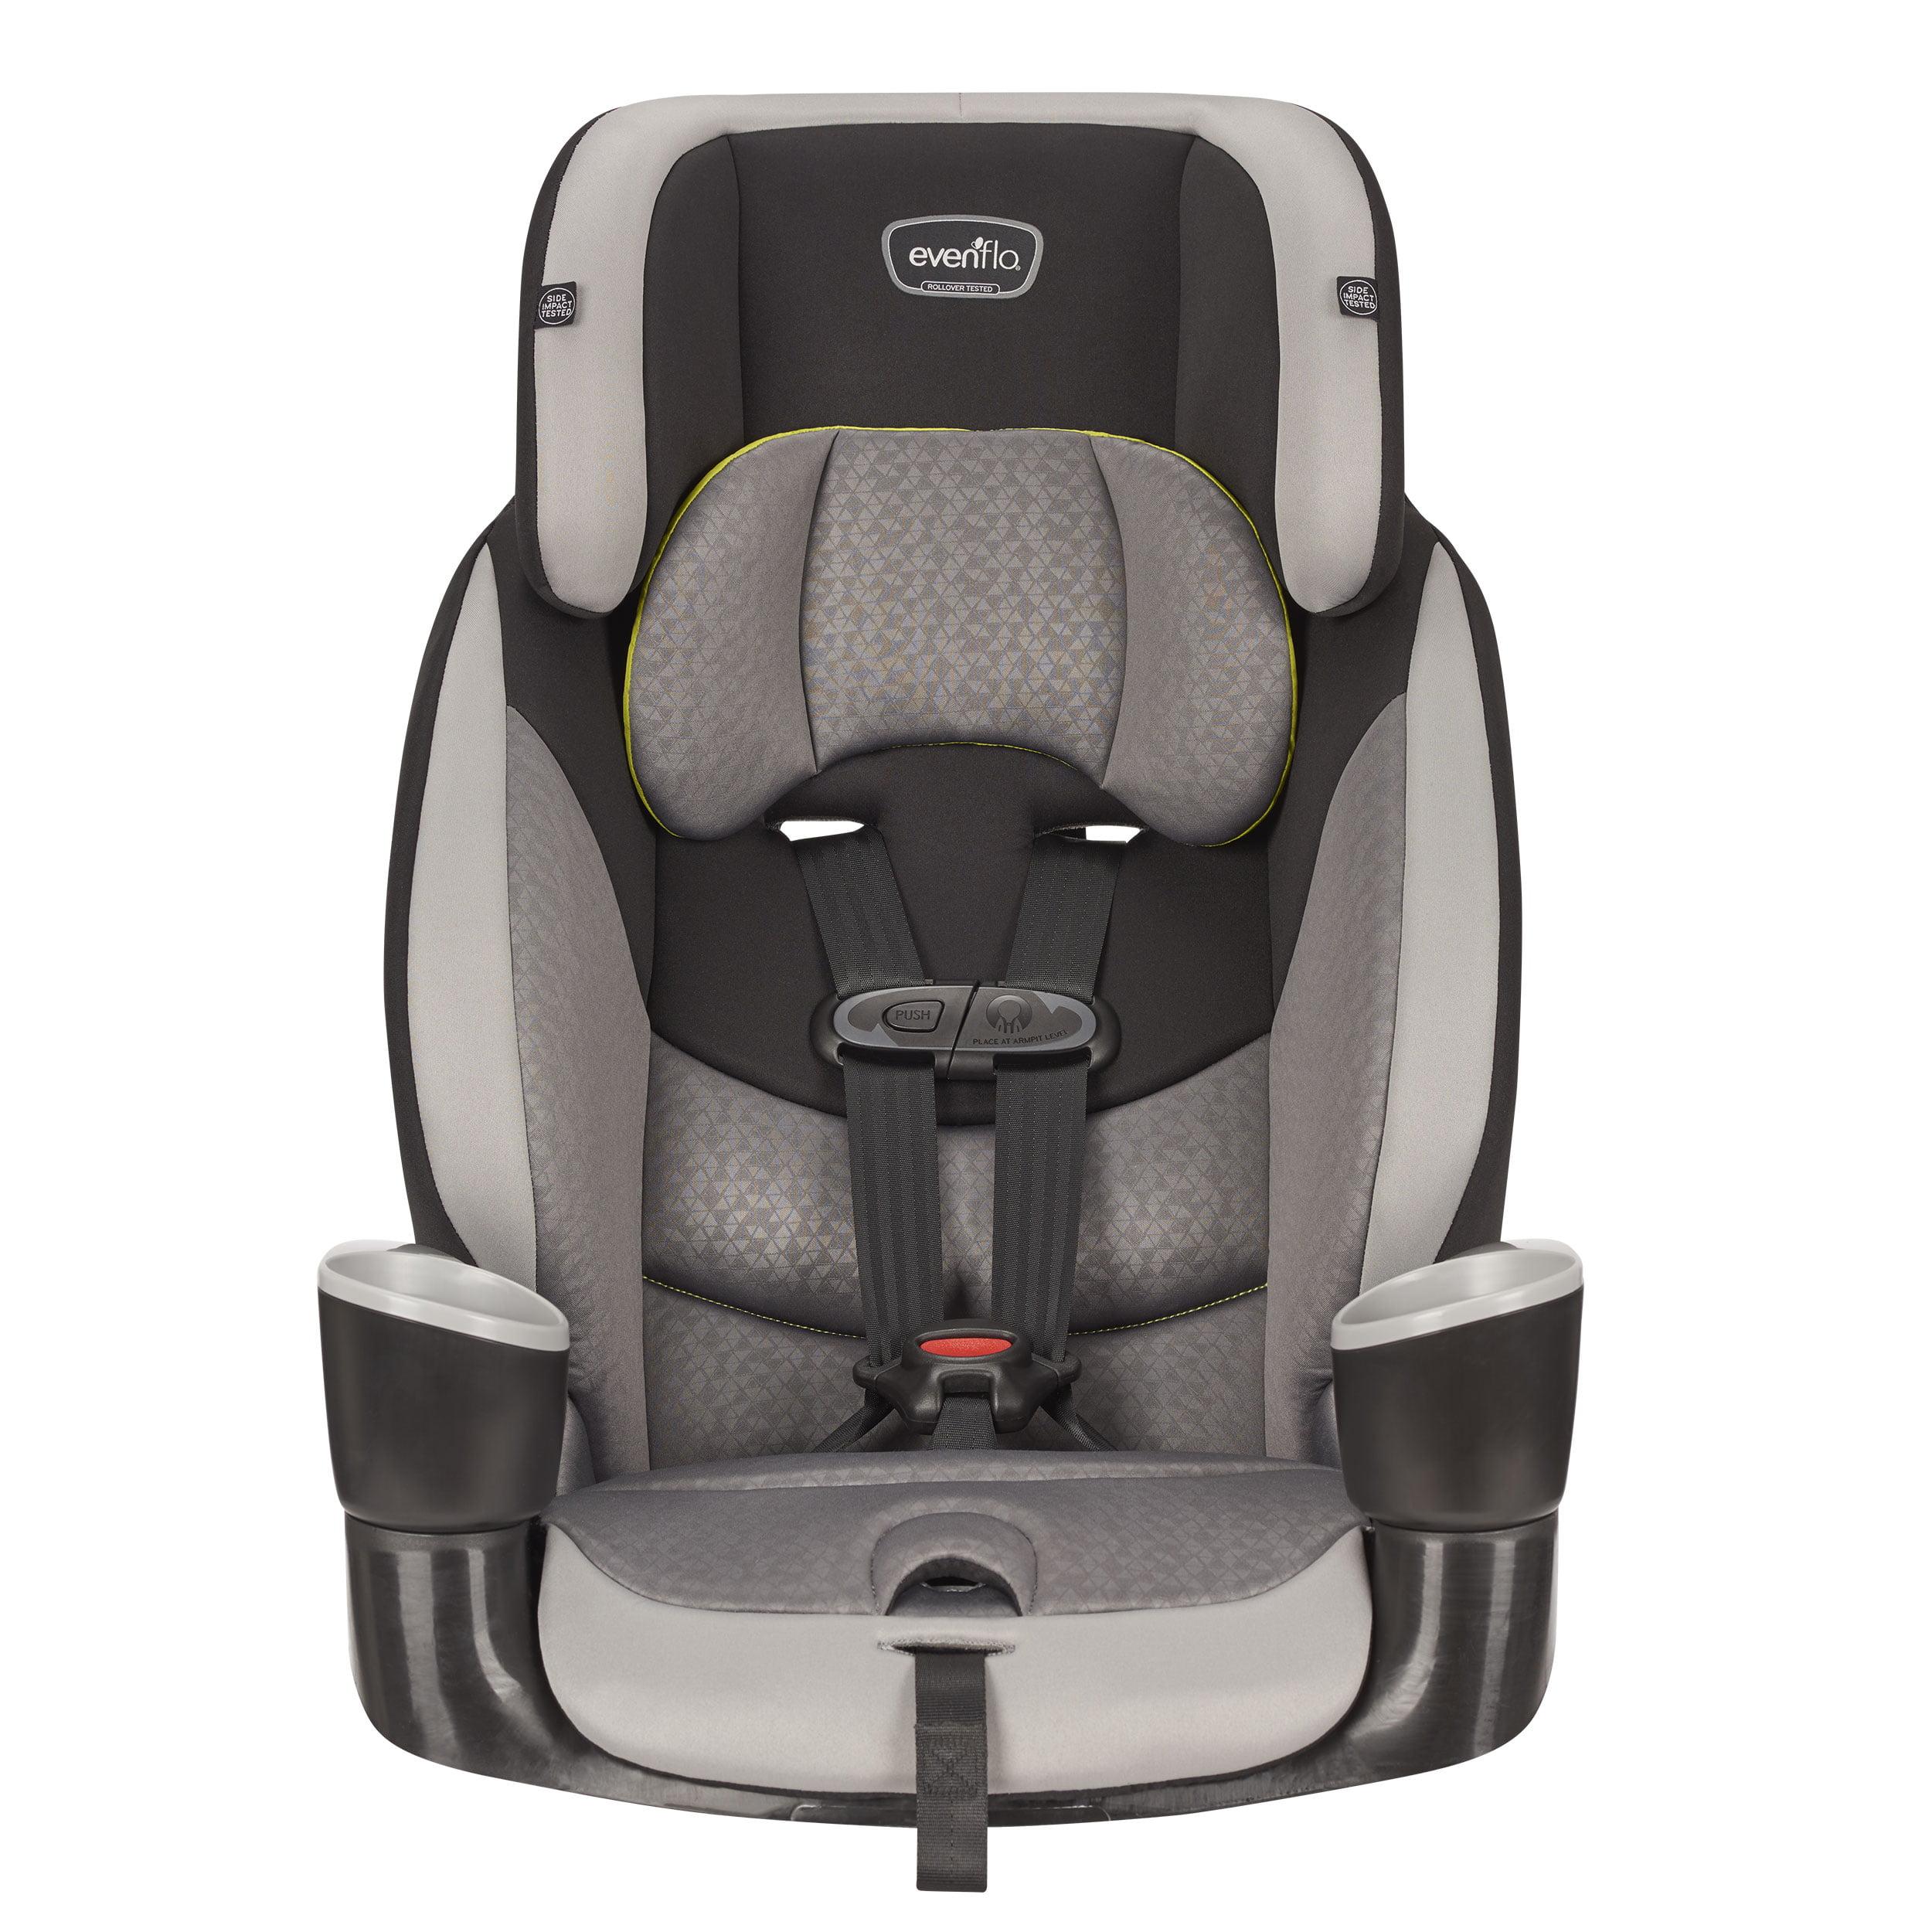 Evenflo Maestro Sport Harness Booster Car Seat - Crestone Peaks